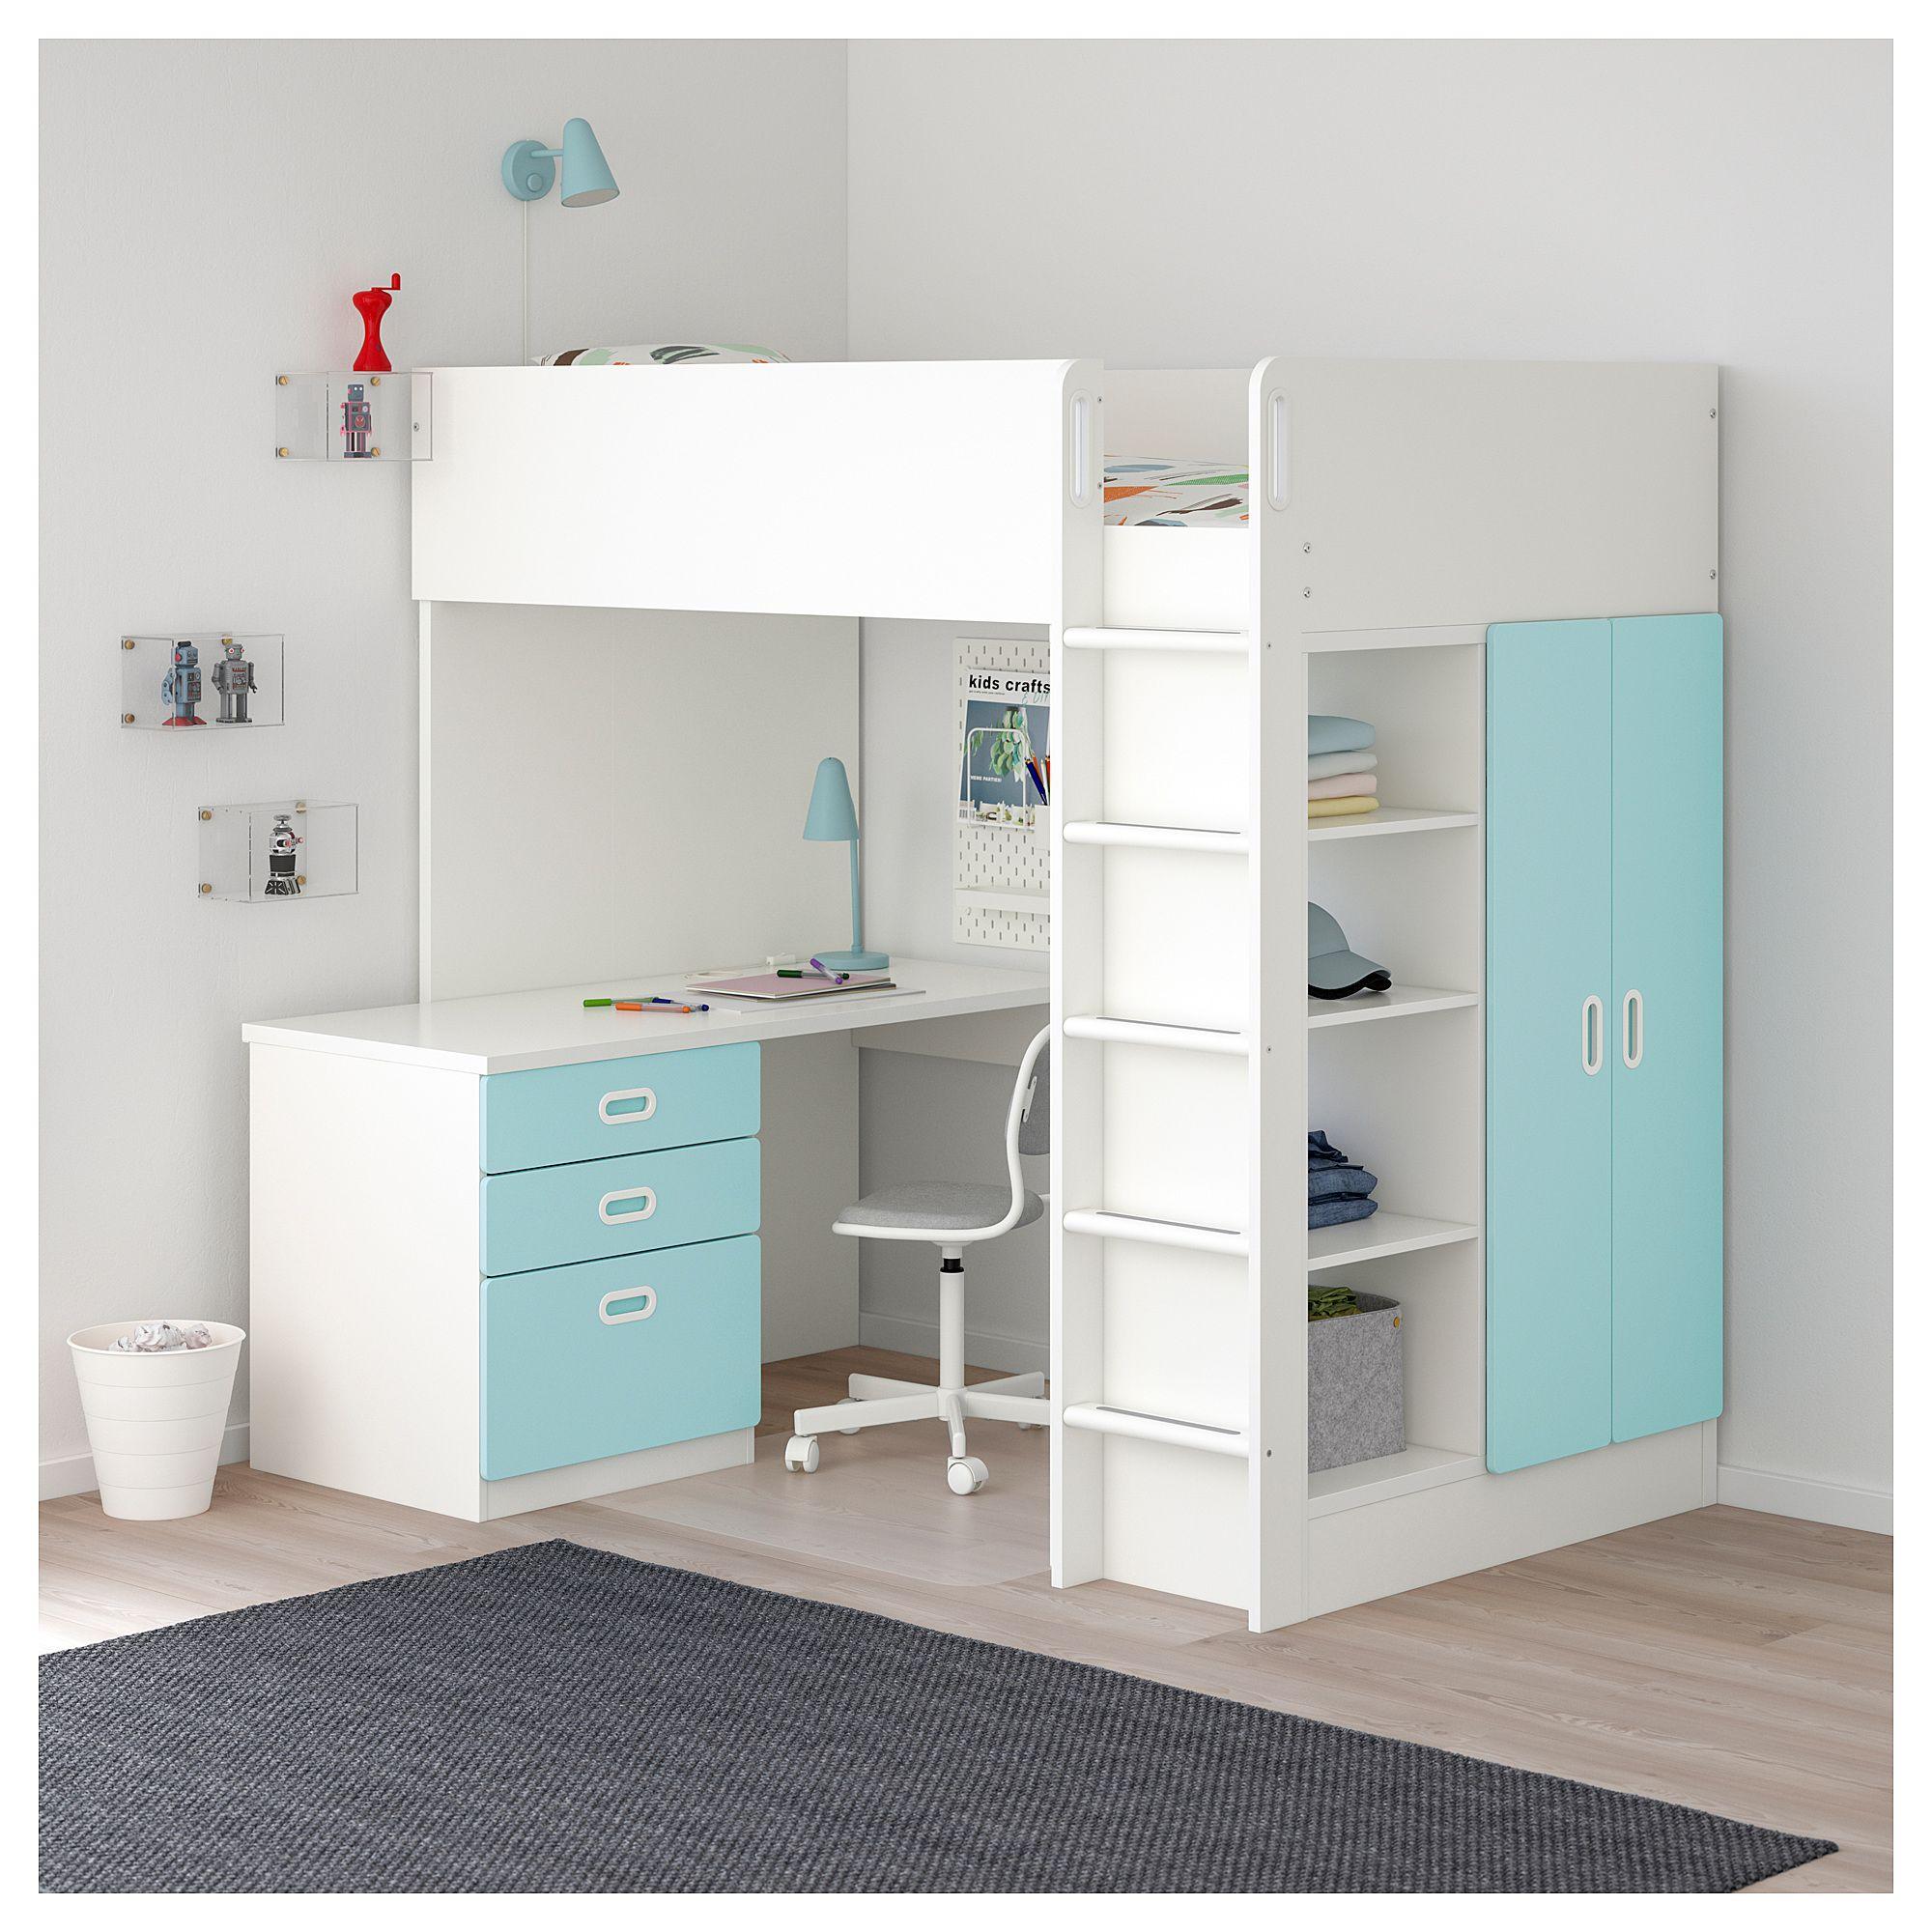 Ikea stuva fritids loft bed with drawers doors white light also blue rh pinterest